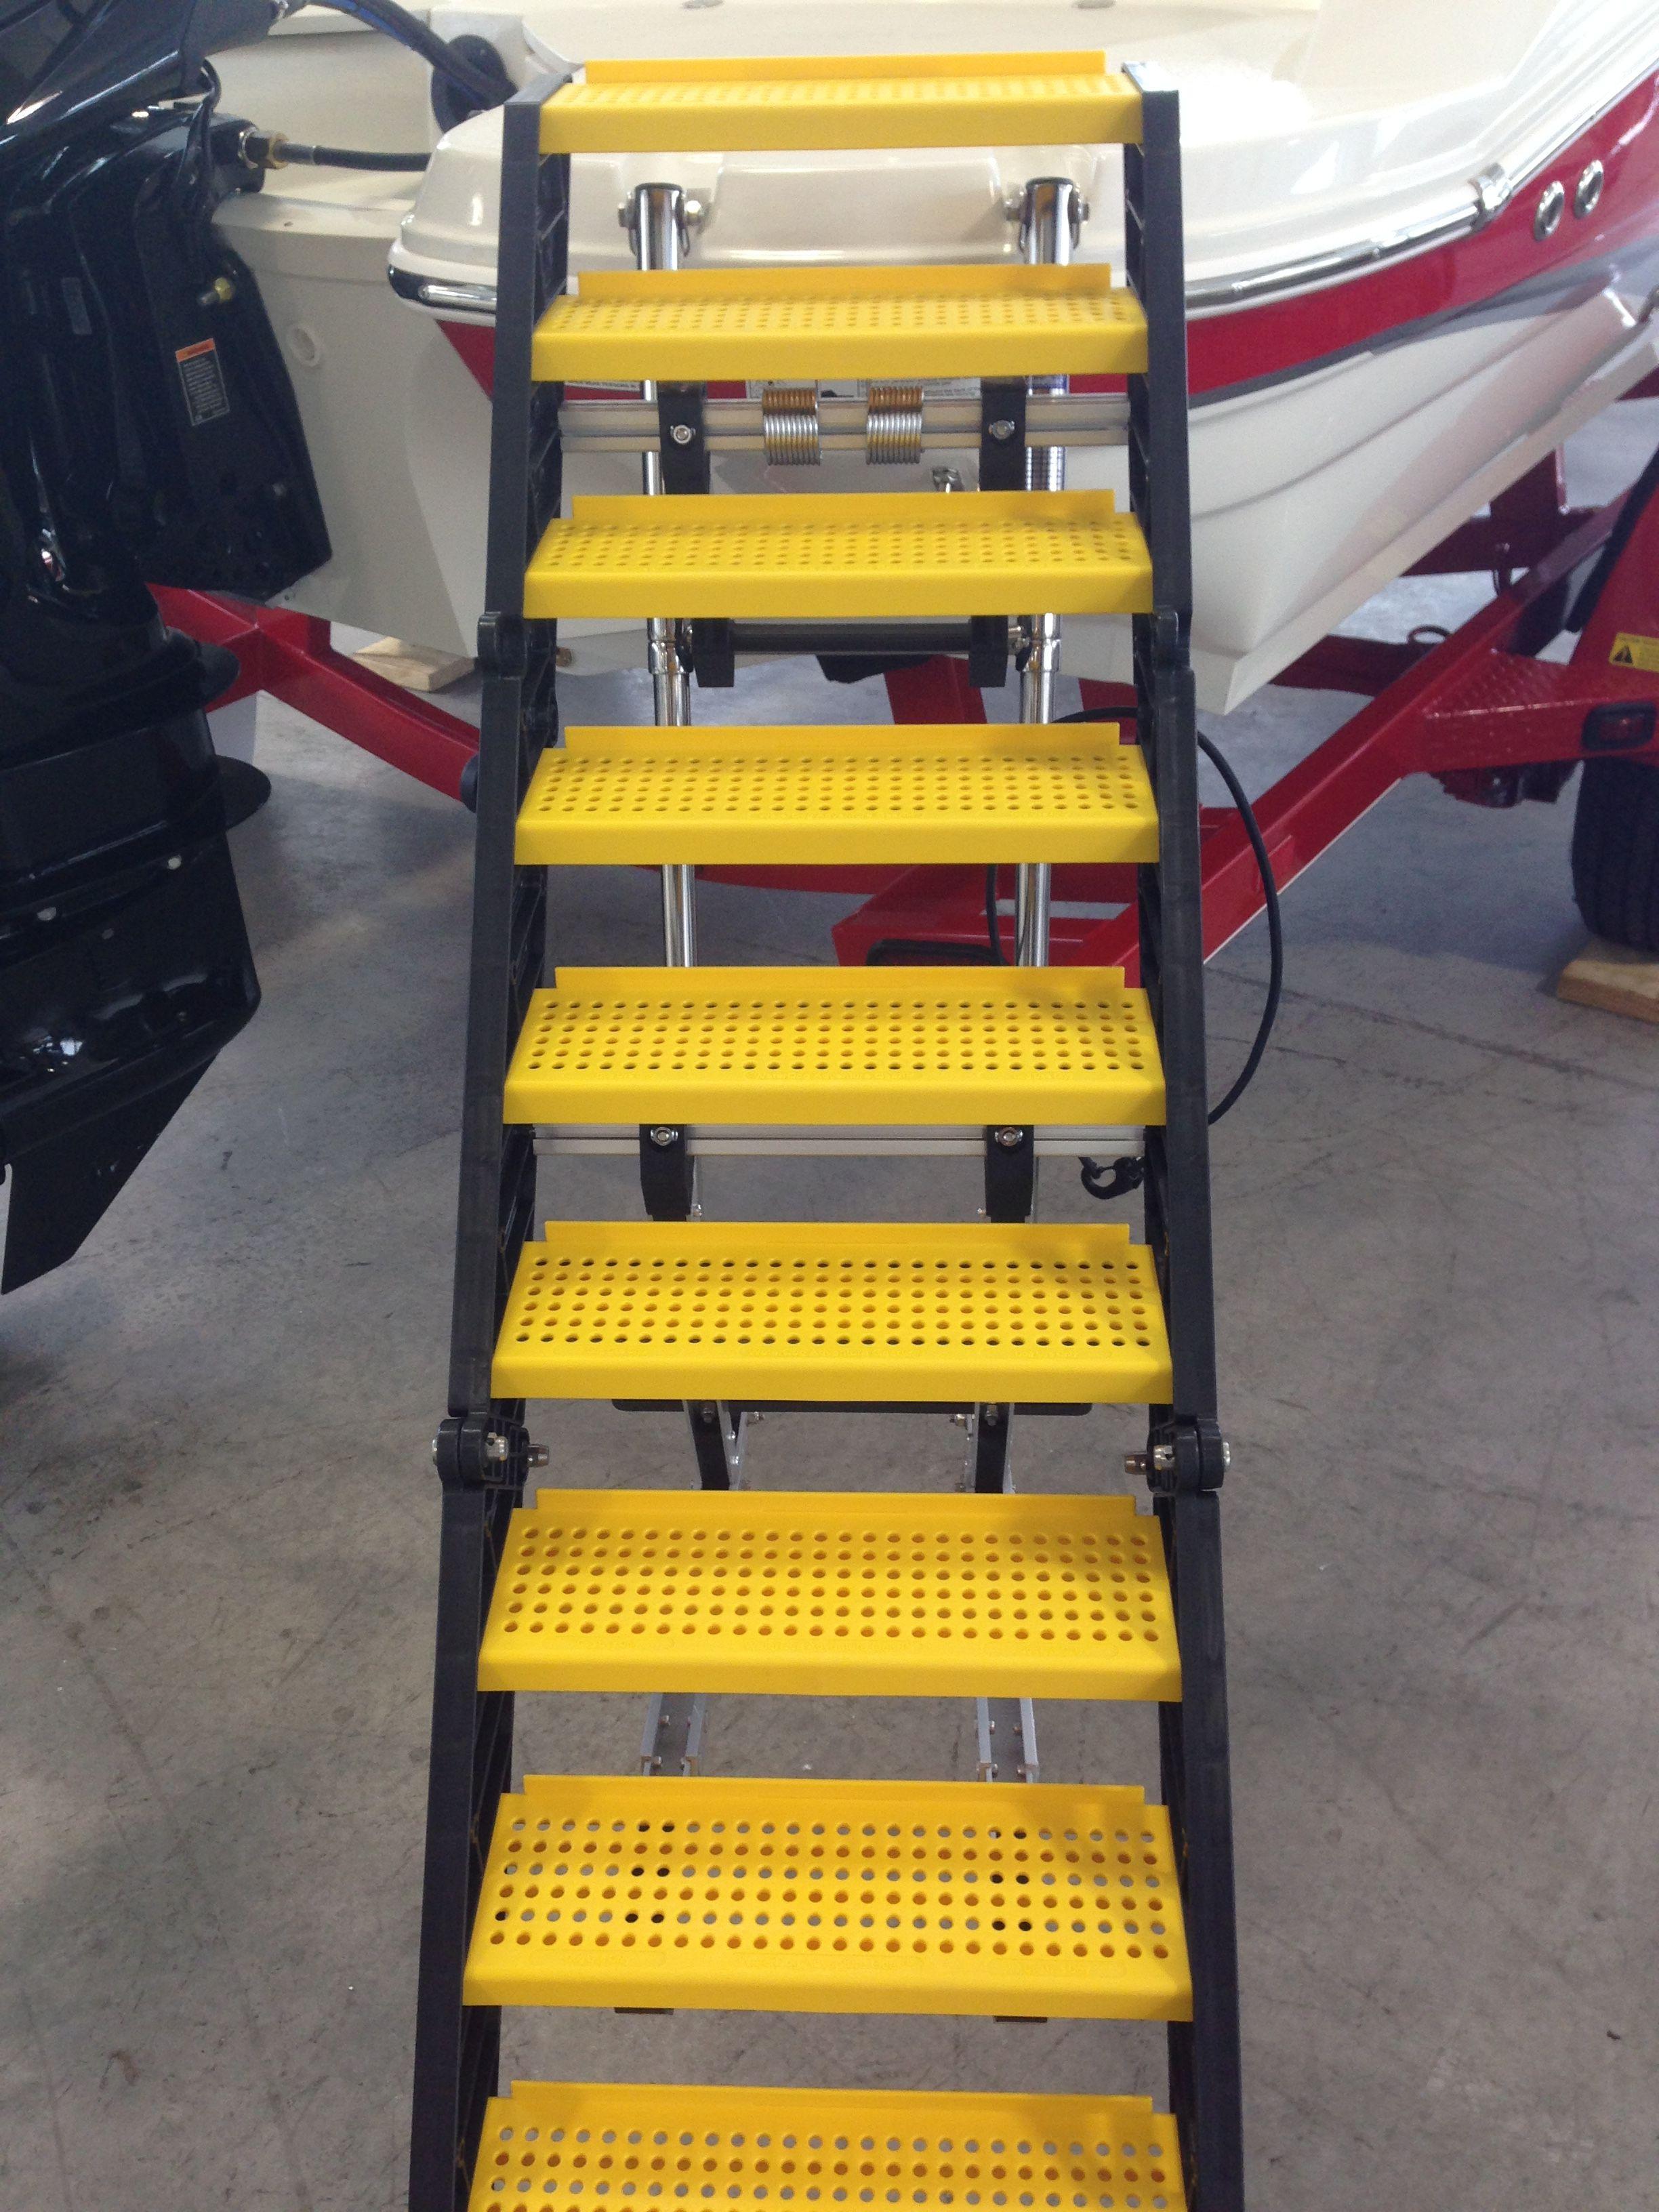 Dog Ladders By Adventure Gear Ladder Boat